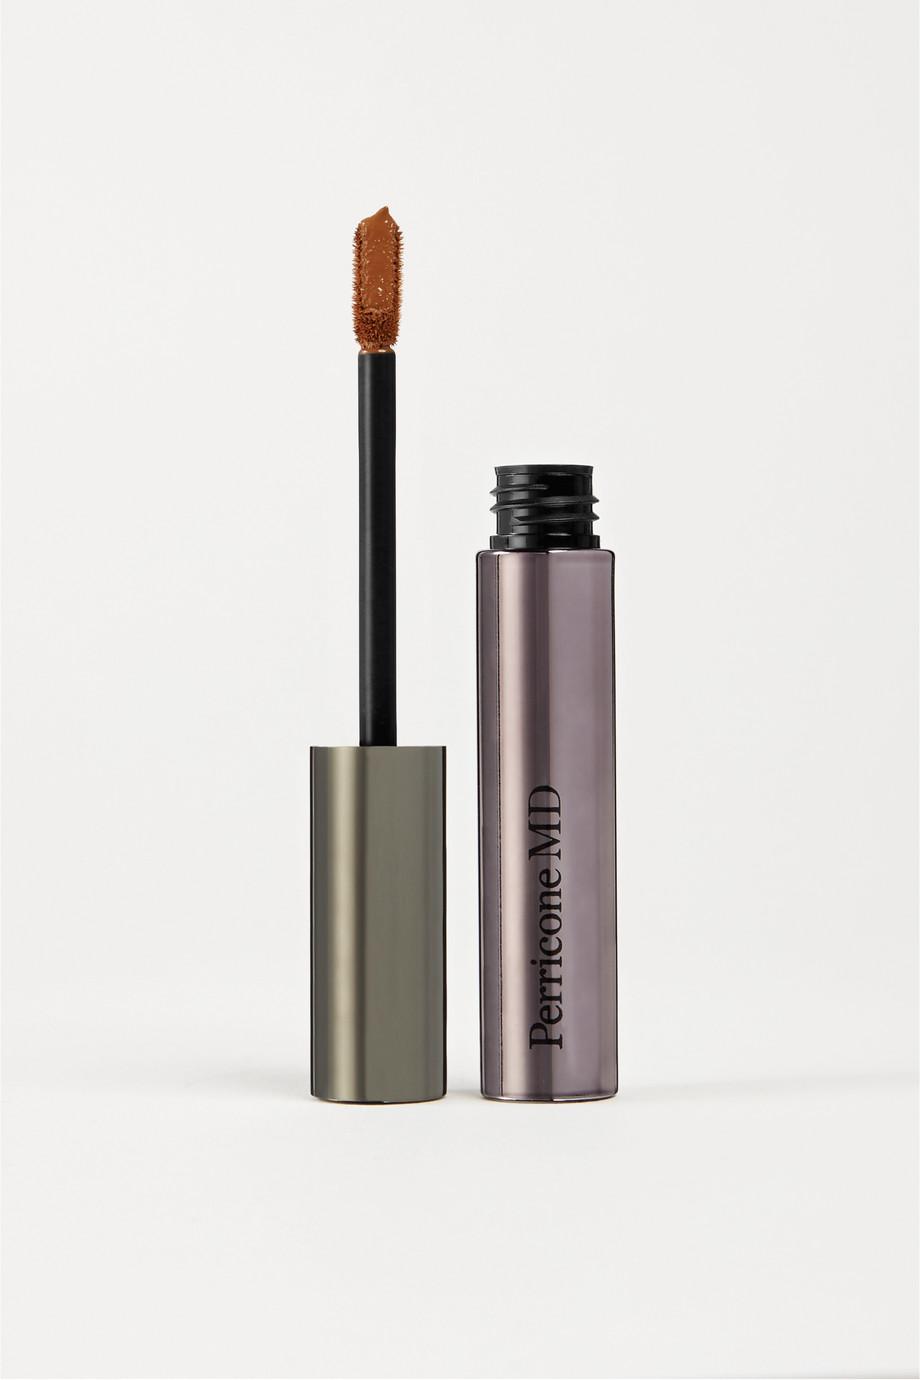 Perricone MD No Makeup Concealer Broad Spectrum SPF20 - Deep, 10ml